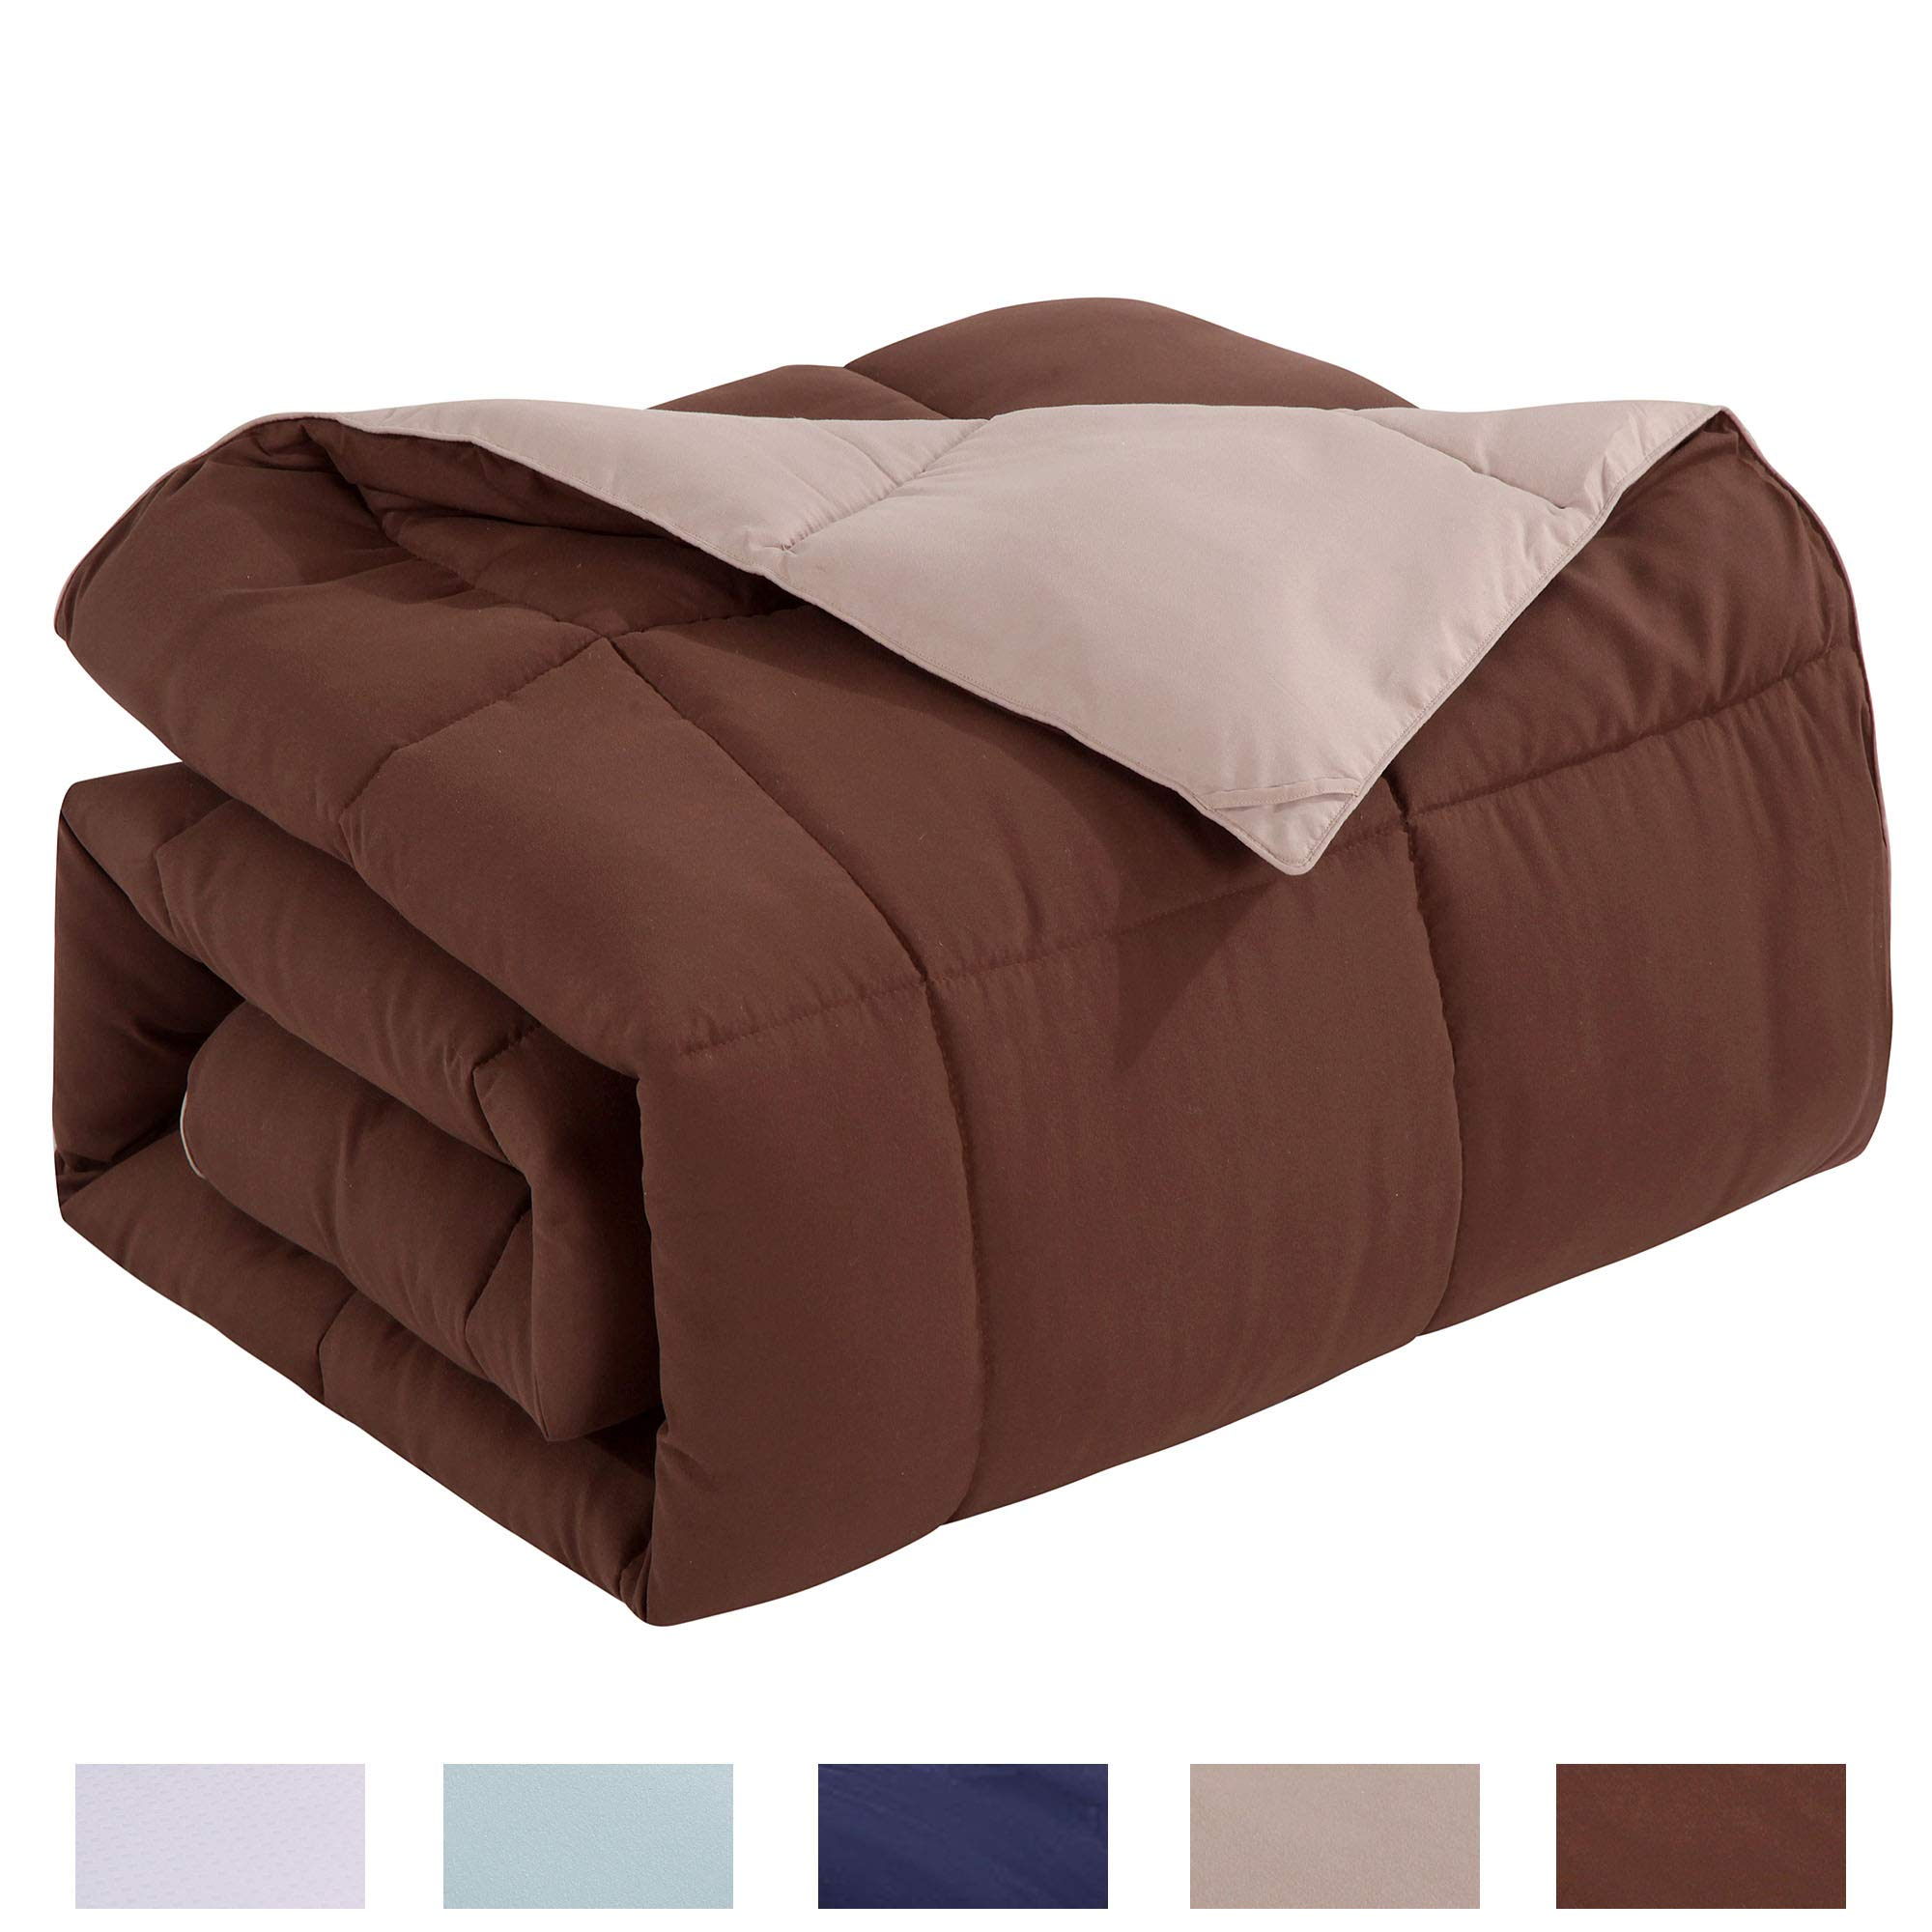 Homelike Moment Lightweight Reversible Comforter Down Alternative Queen All Season Duvet Insert Microfiber Comforter Chocolate Brown/Khaki Full/Queen Size With Corner Tabs Hypoallergenic by Homelike Moment